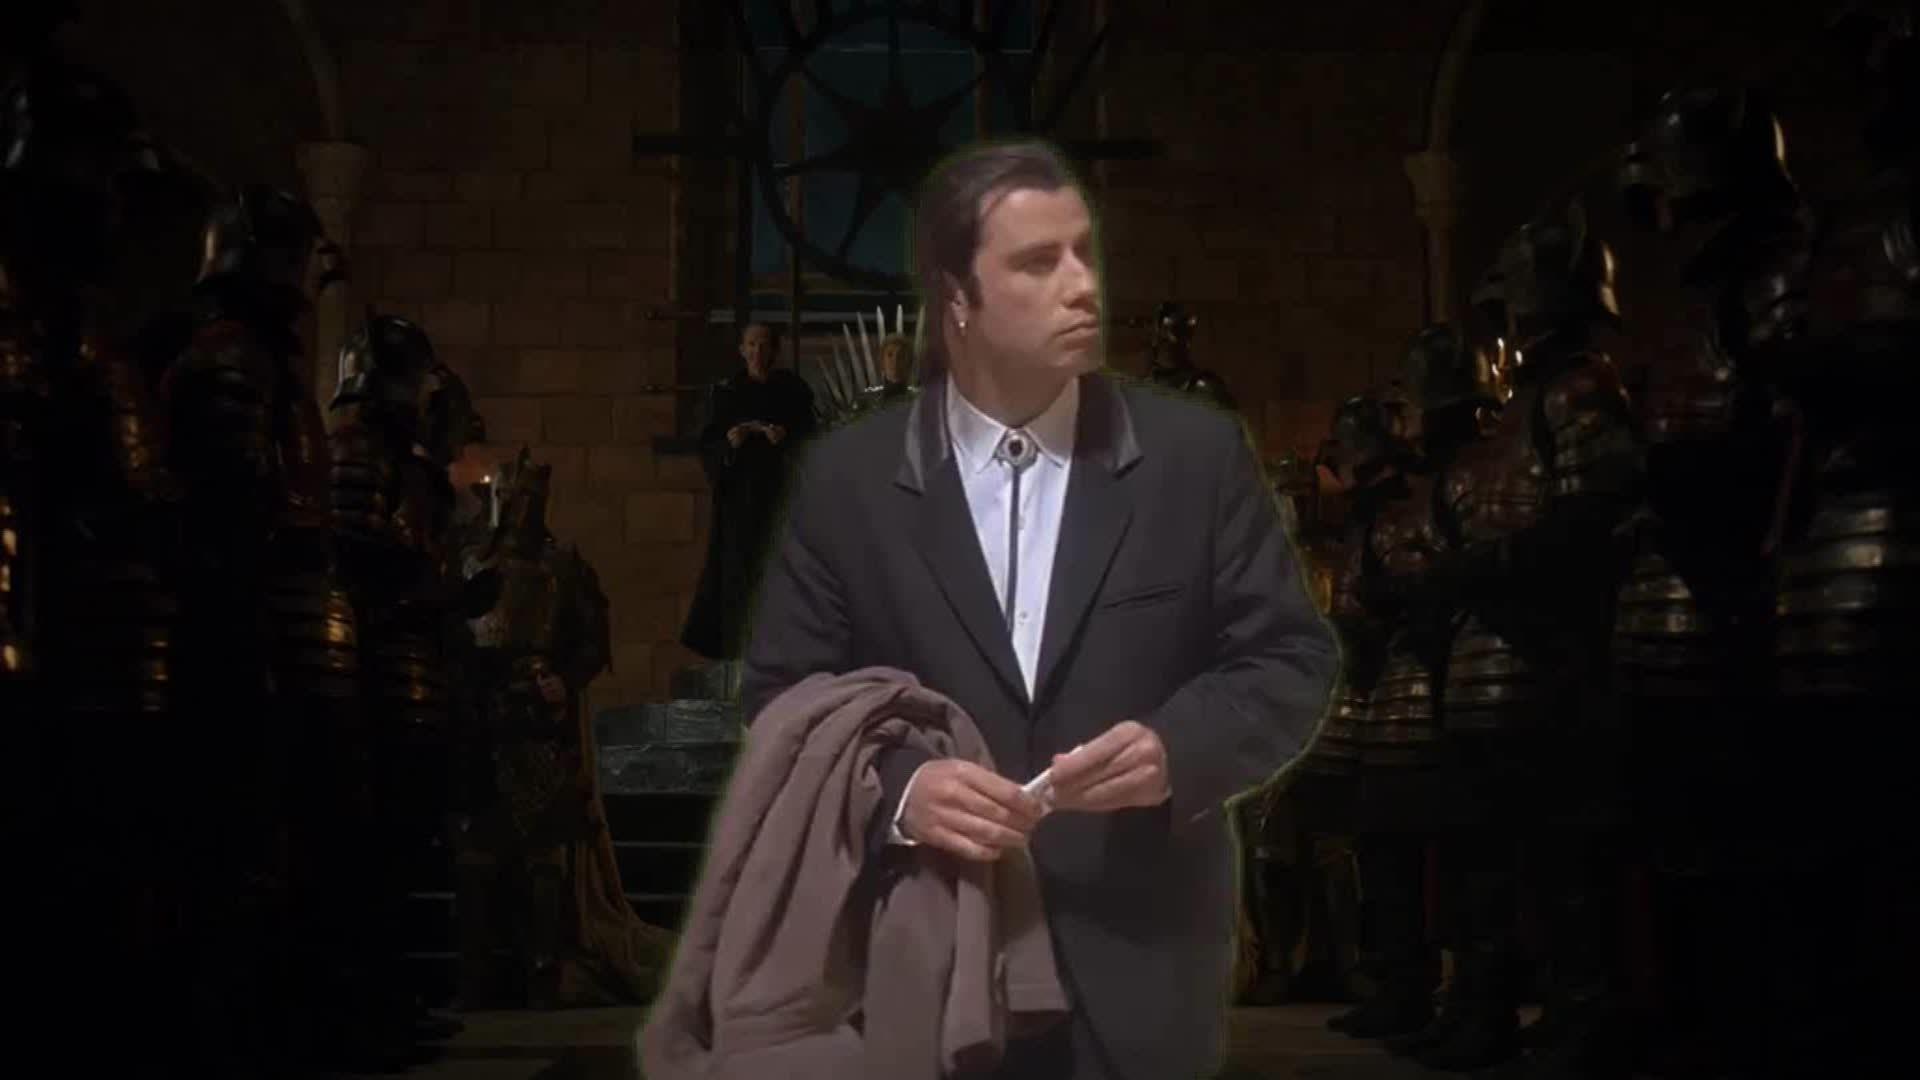 John Travolta, asongofmemesandrage, You're fine with this? GIFs